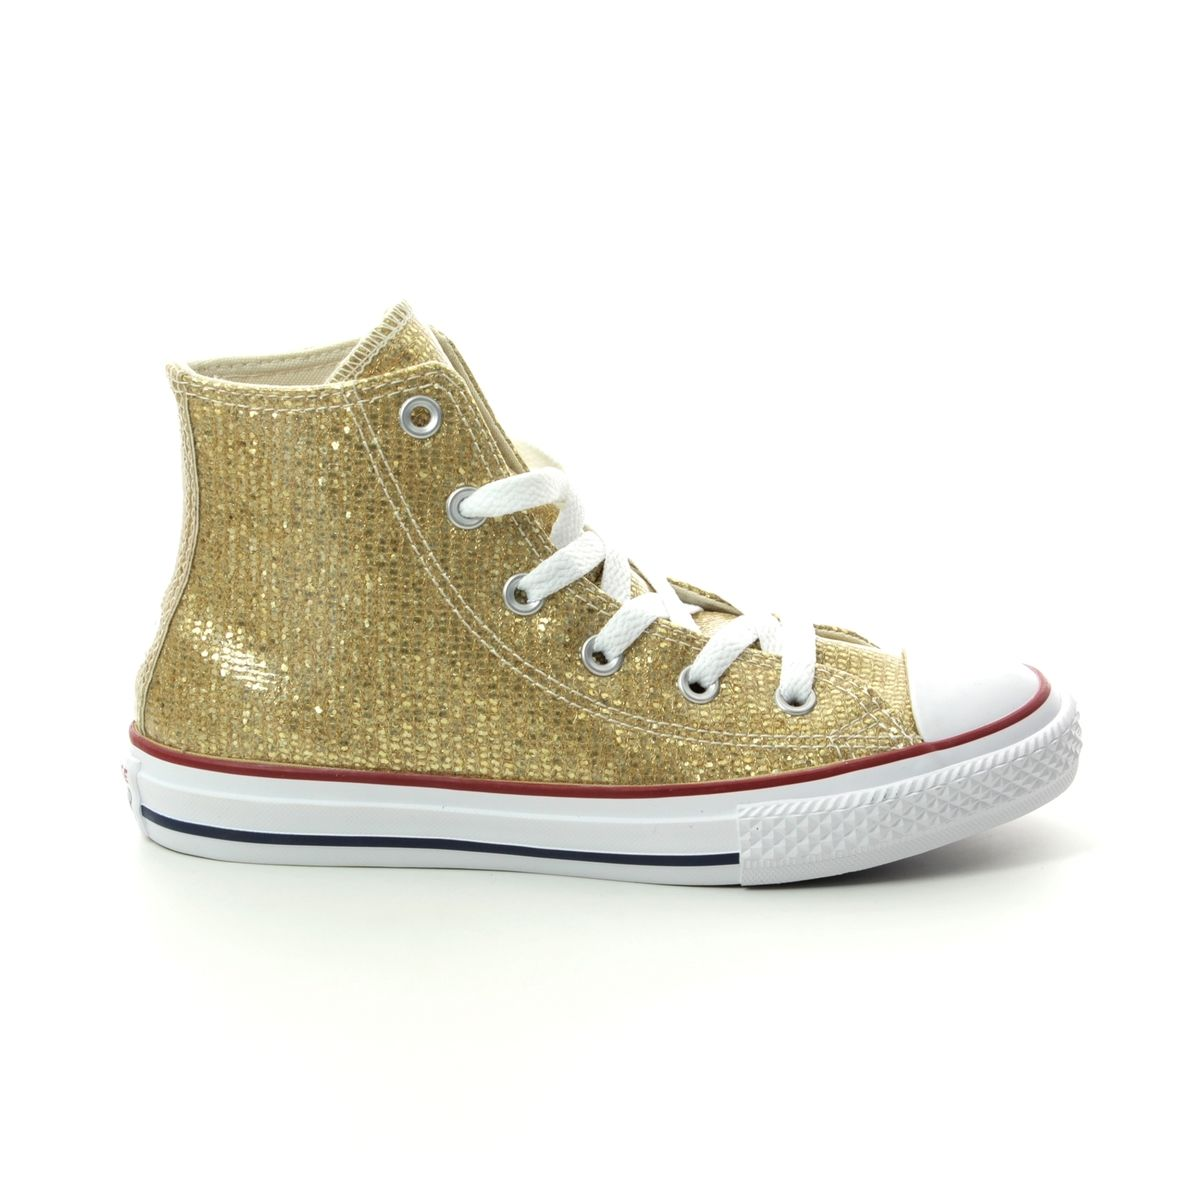 Converse Trainers - Gold - 663625C ALL STAR HI TOP JUNIOR b6a15a89a3339